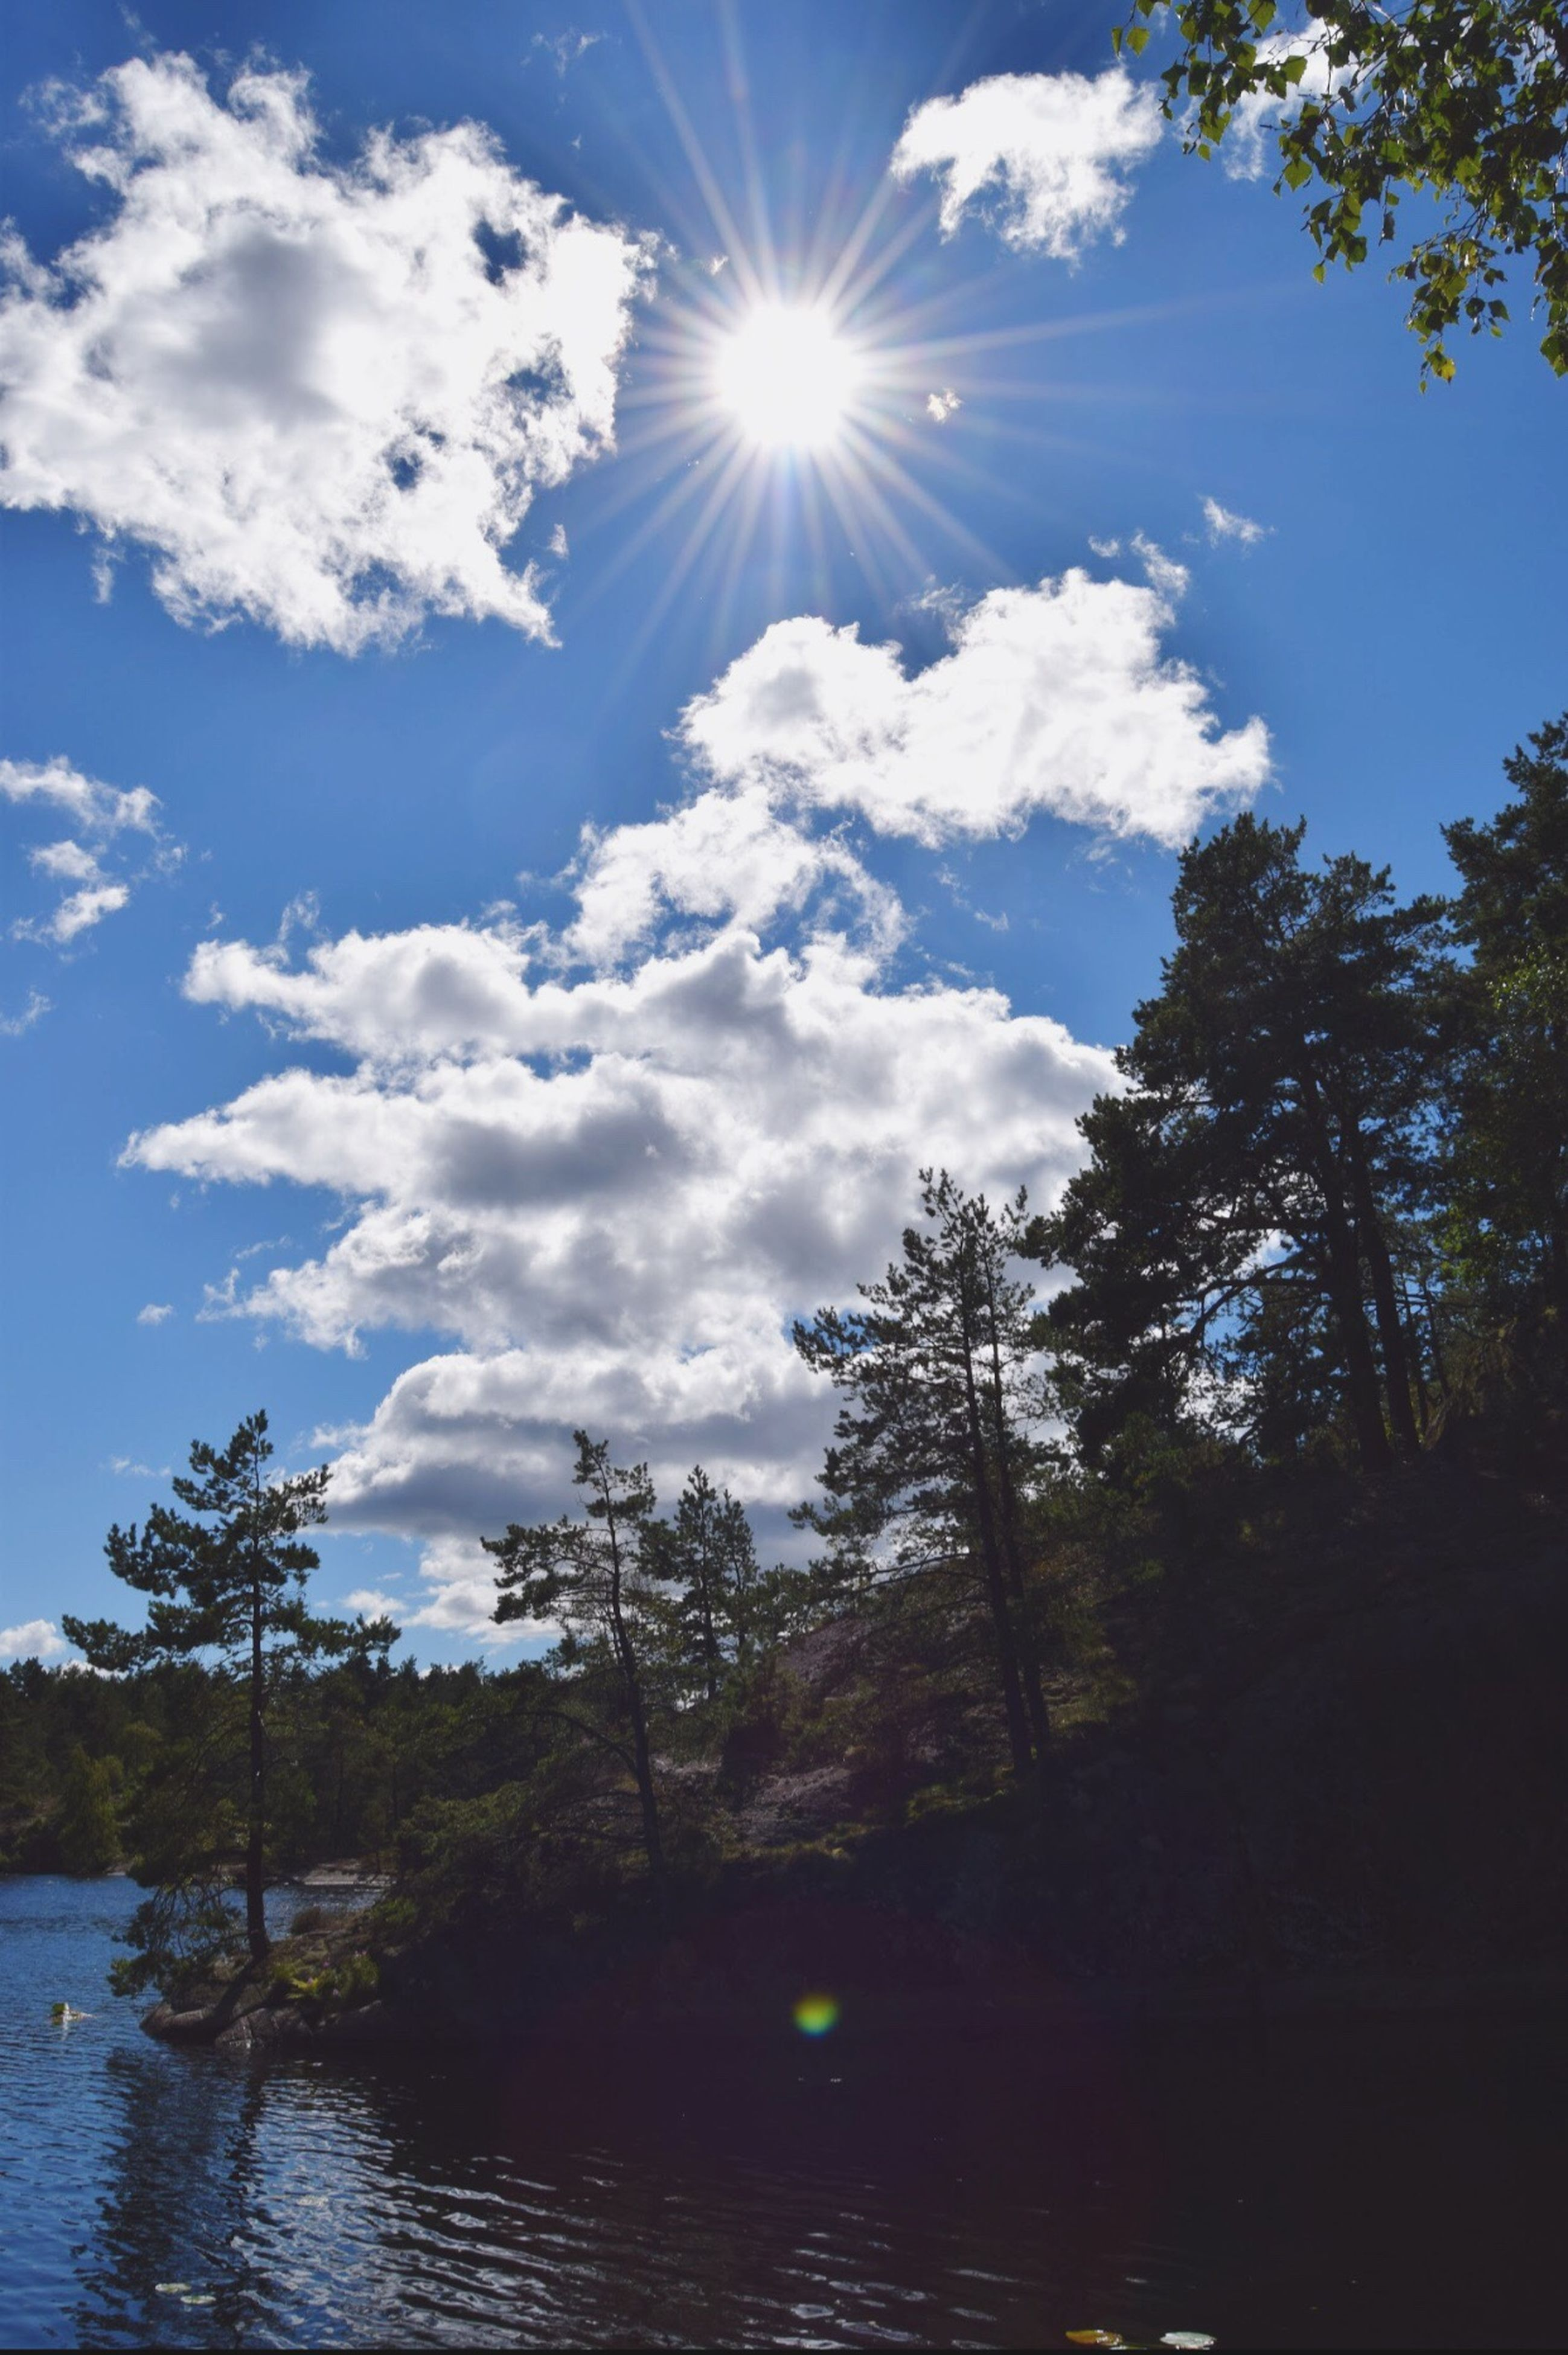 sky, blue, water, tree, sun, cloud - sky, nature, sunlight, outdoors, sunbeam, no people, scenics, beauty in nature, day